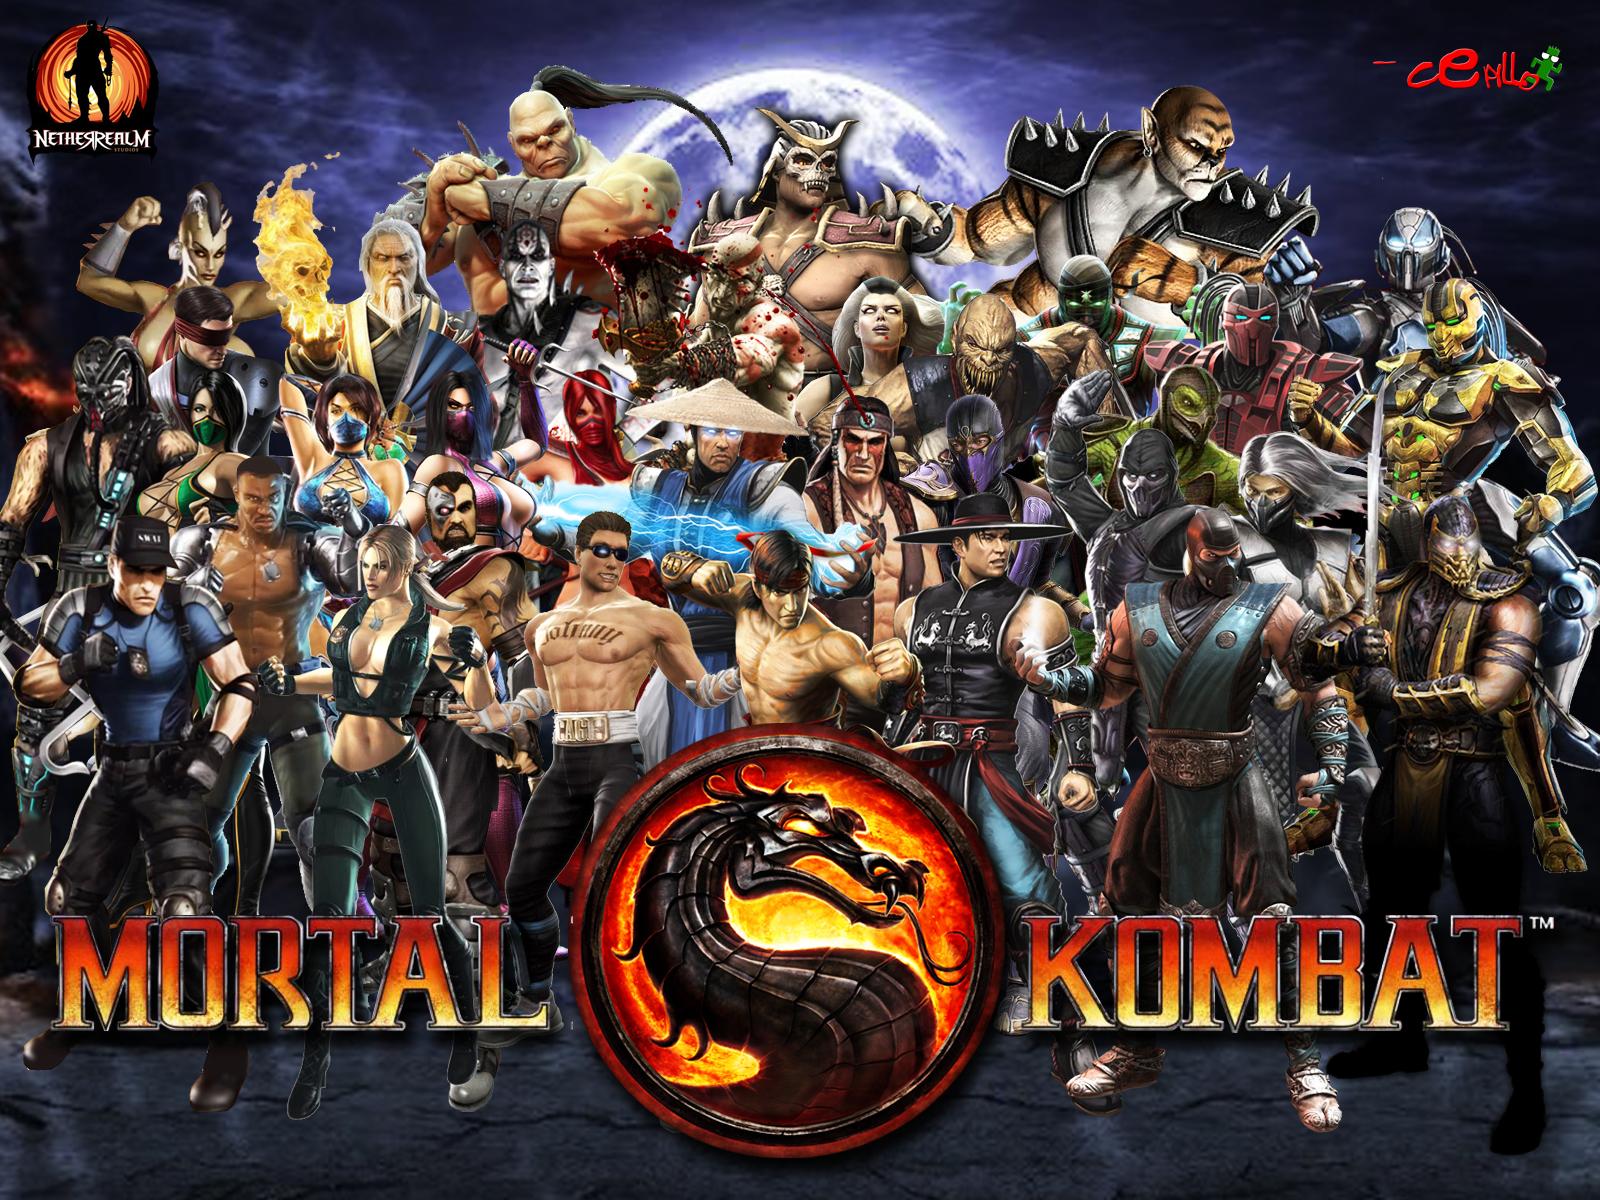 Mortal kombat 9 cast - Copy.jpg